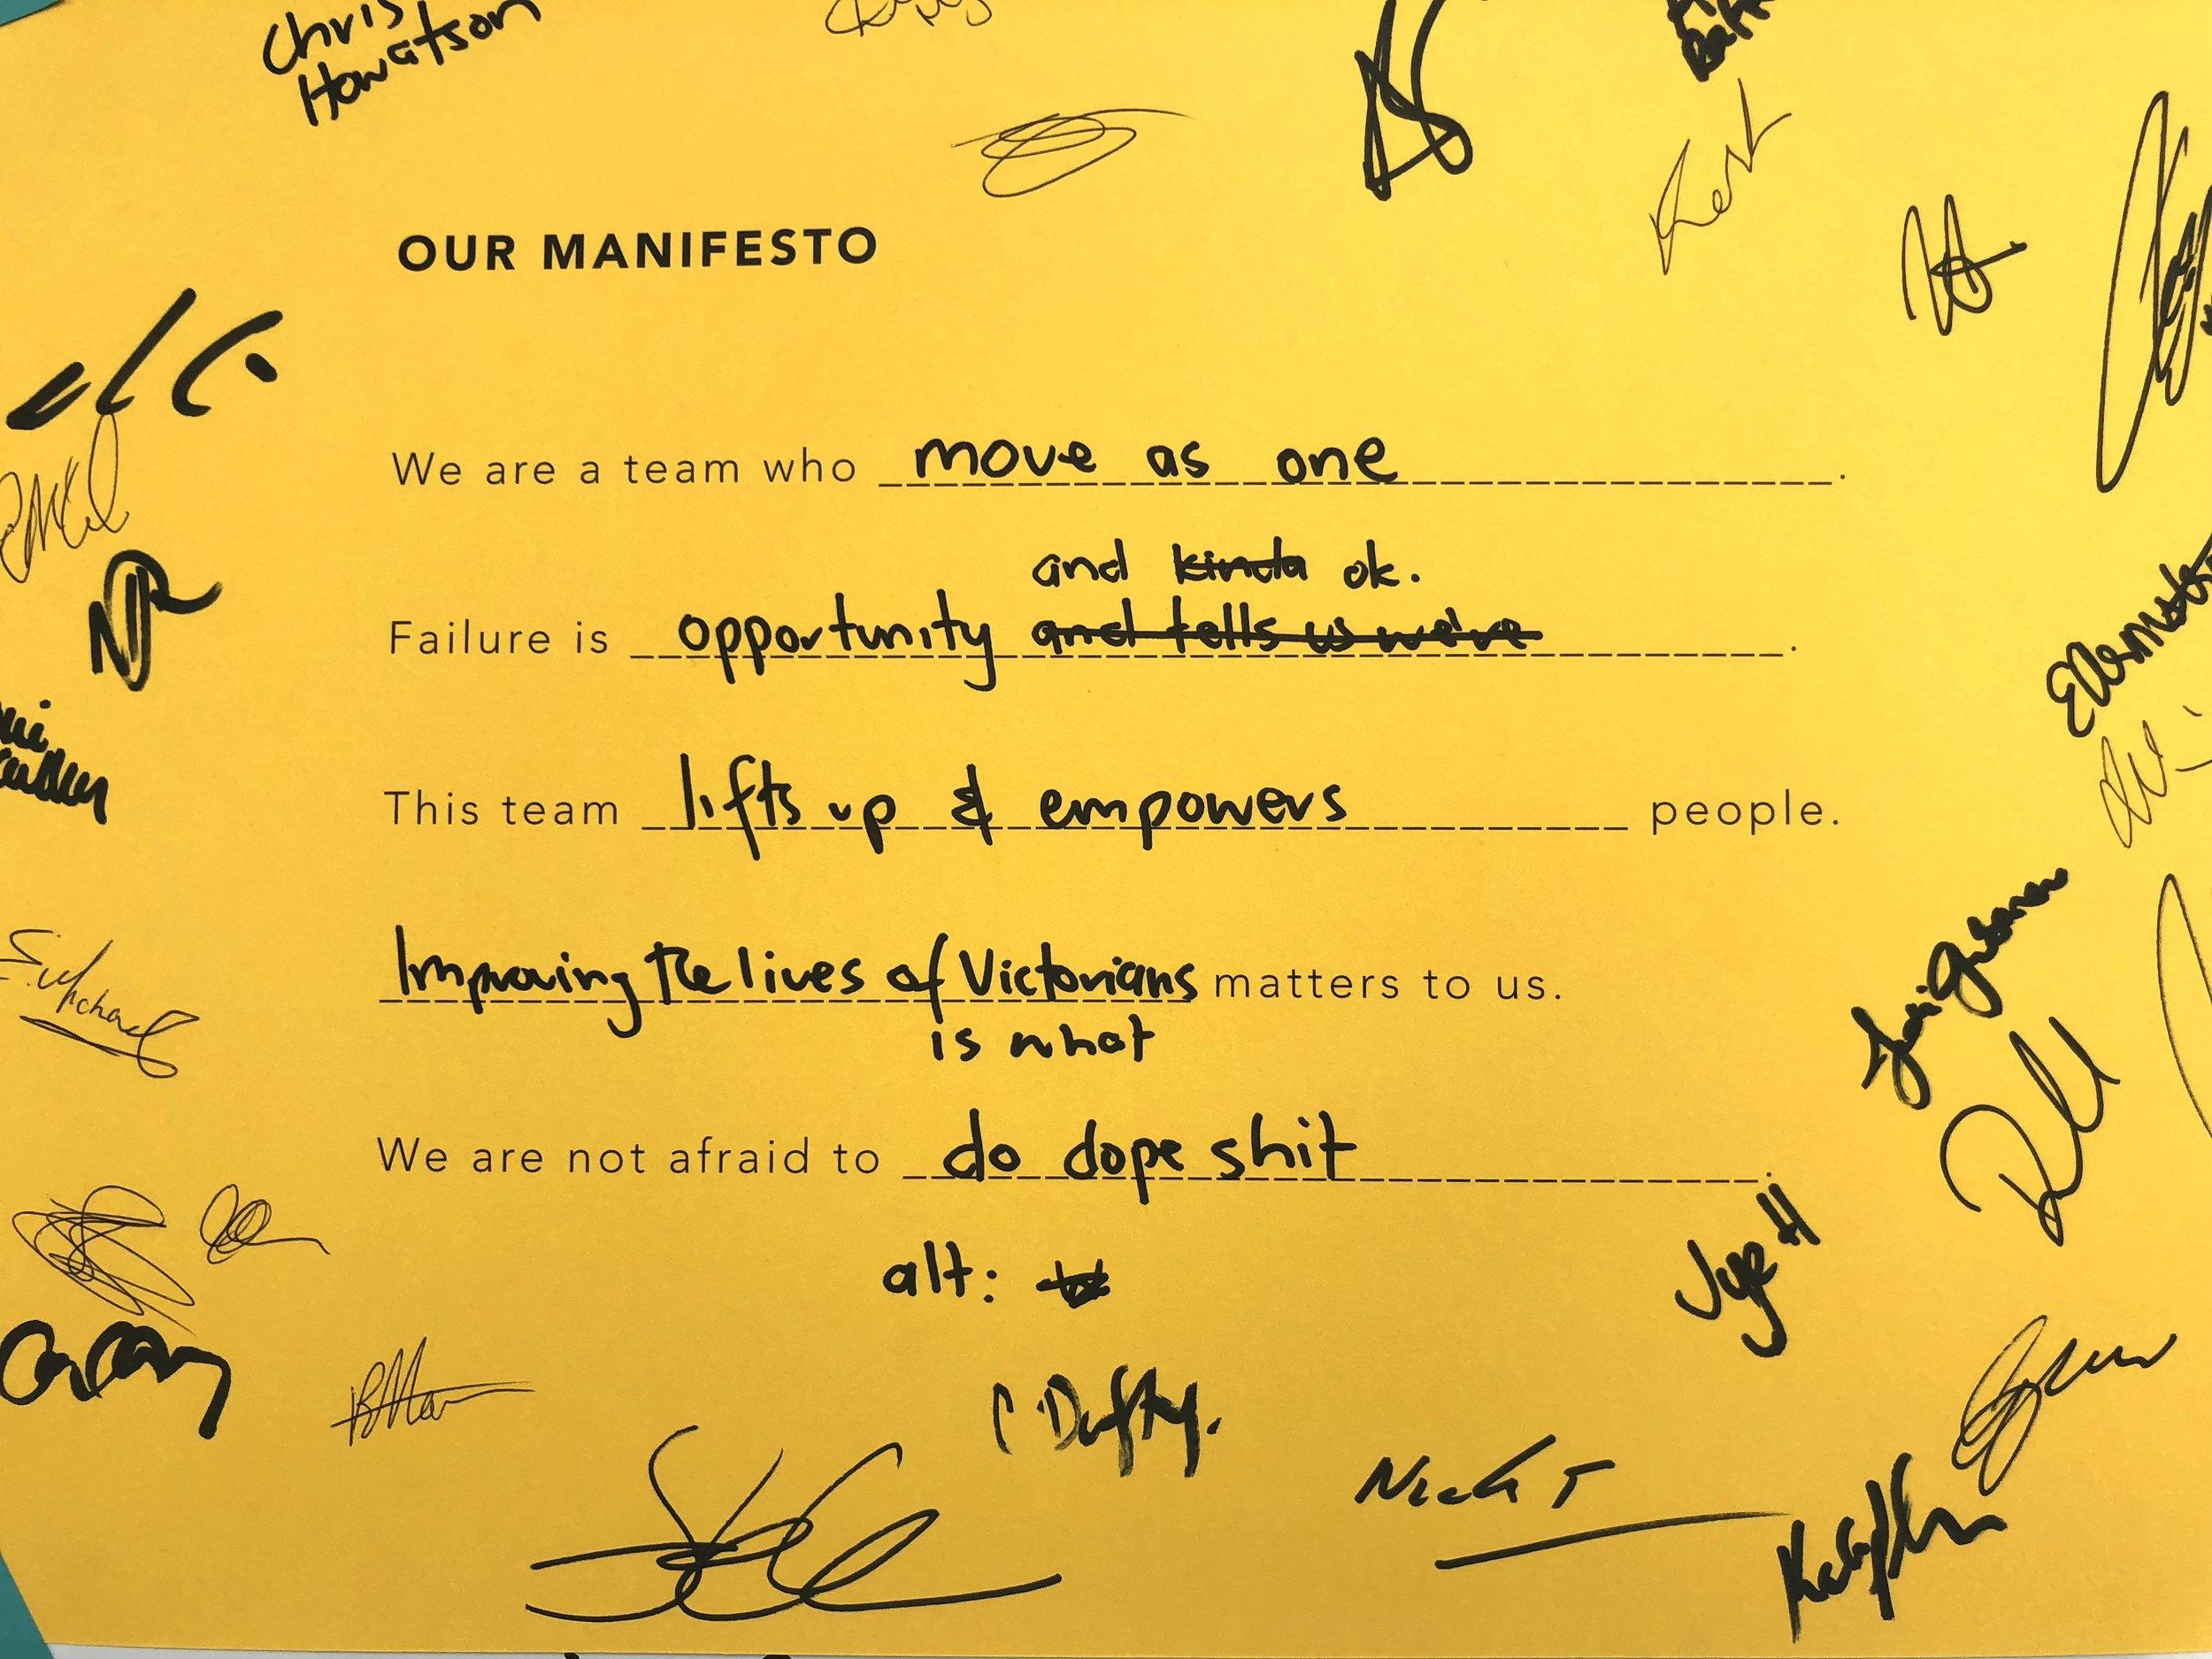 RACV Marketing Manifesto 4 May 2018.jpg